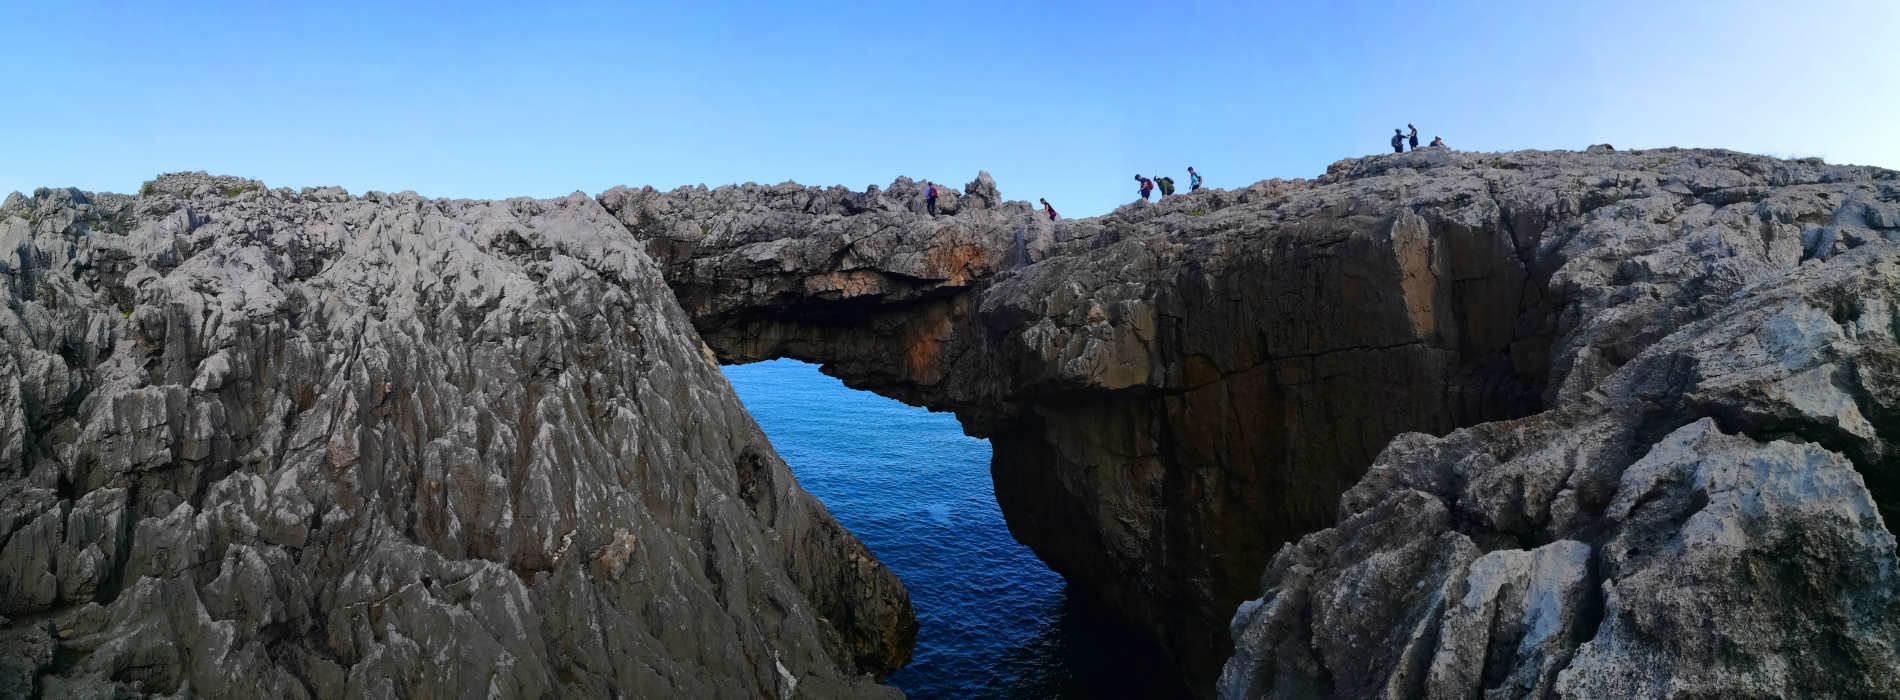 faro-del-norte-senderismo-mar-bici-kayak